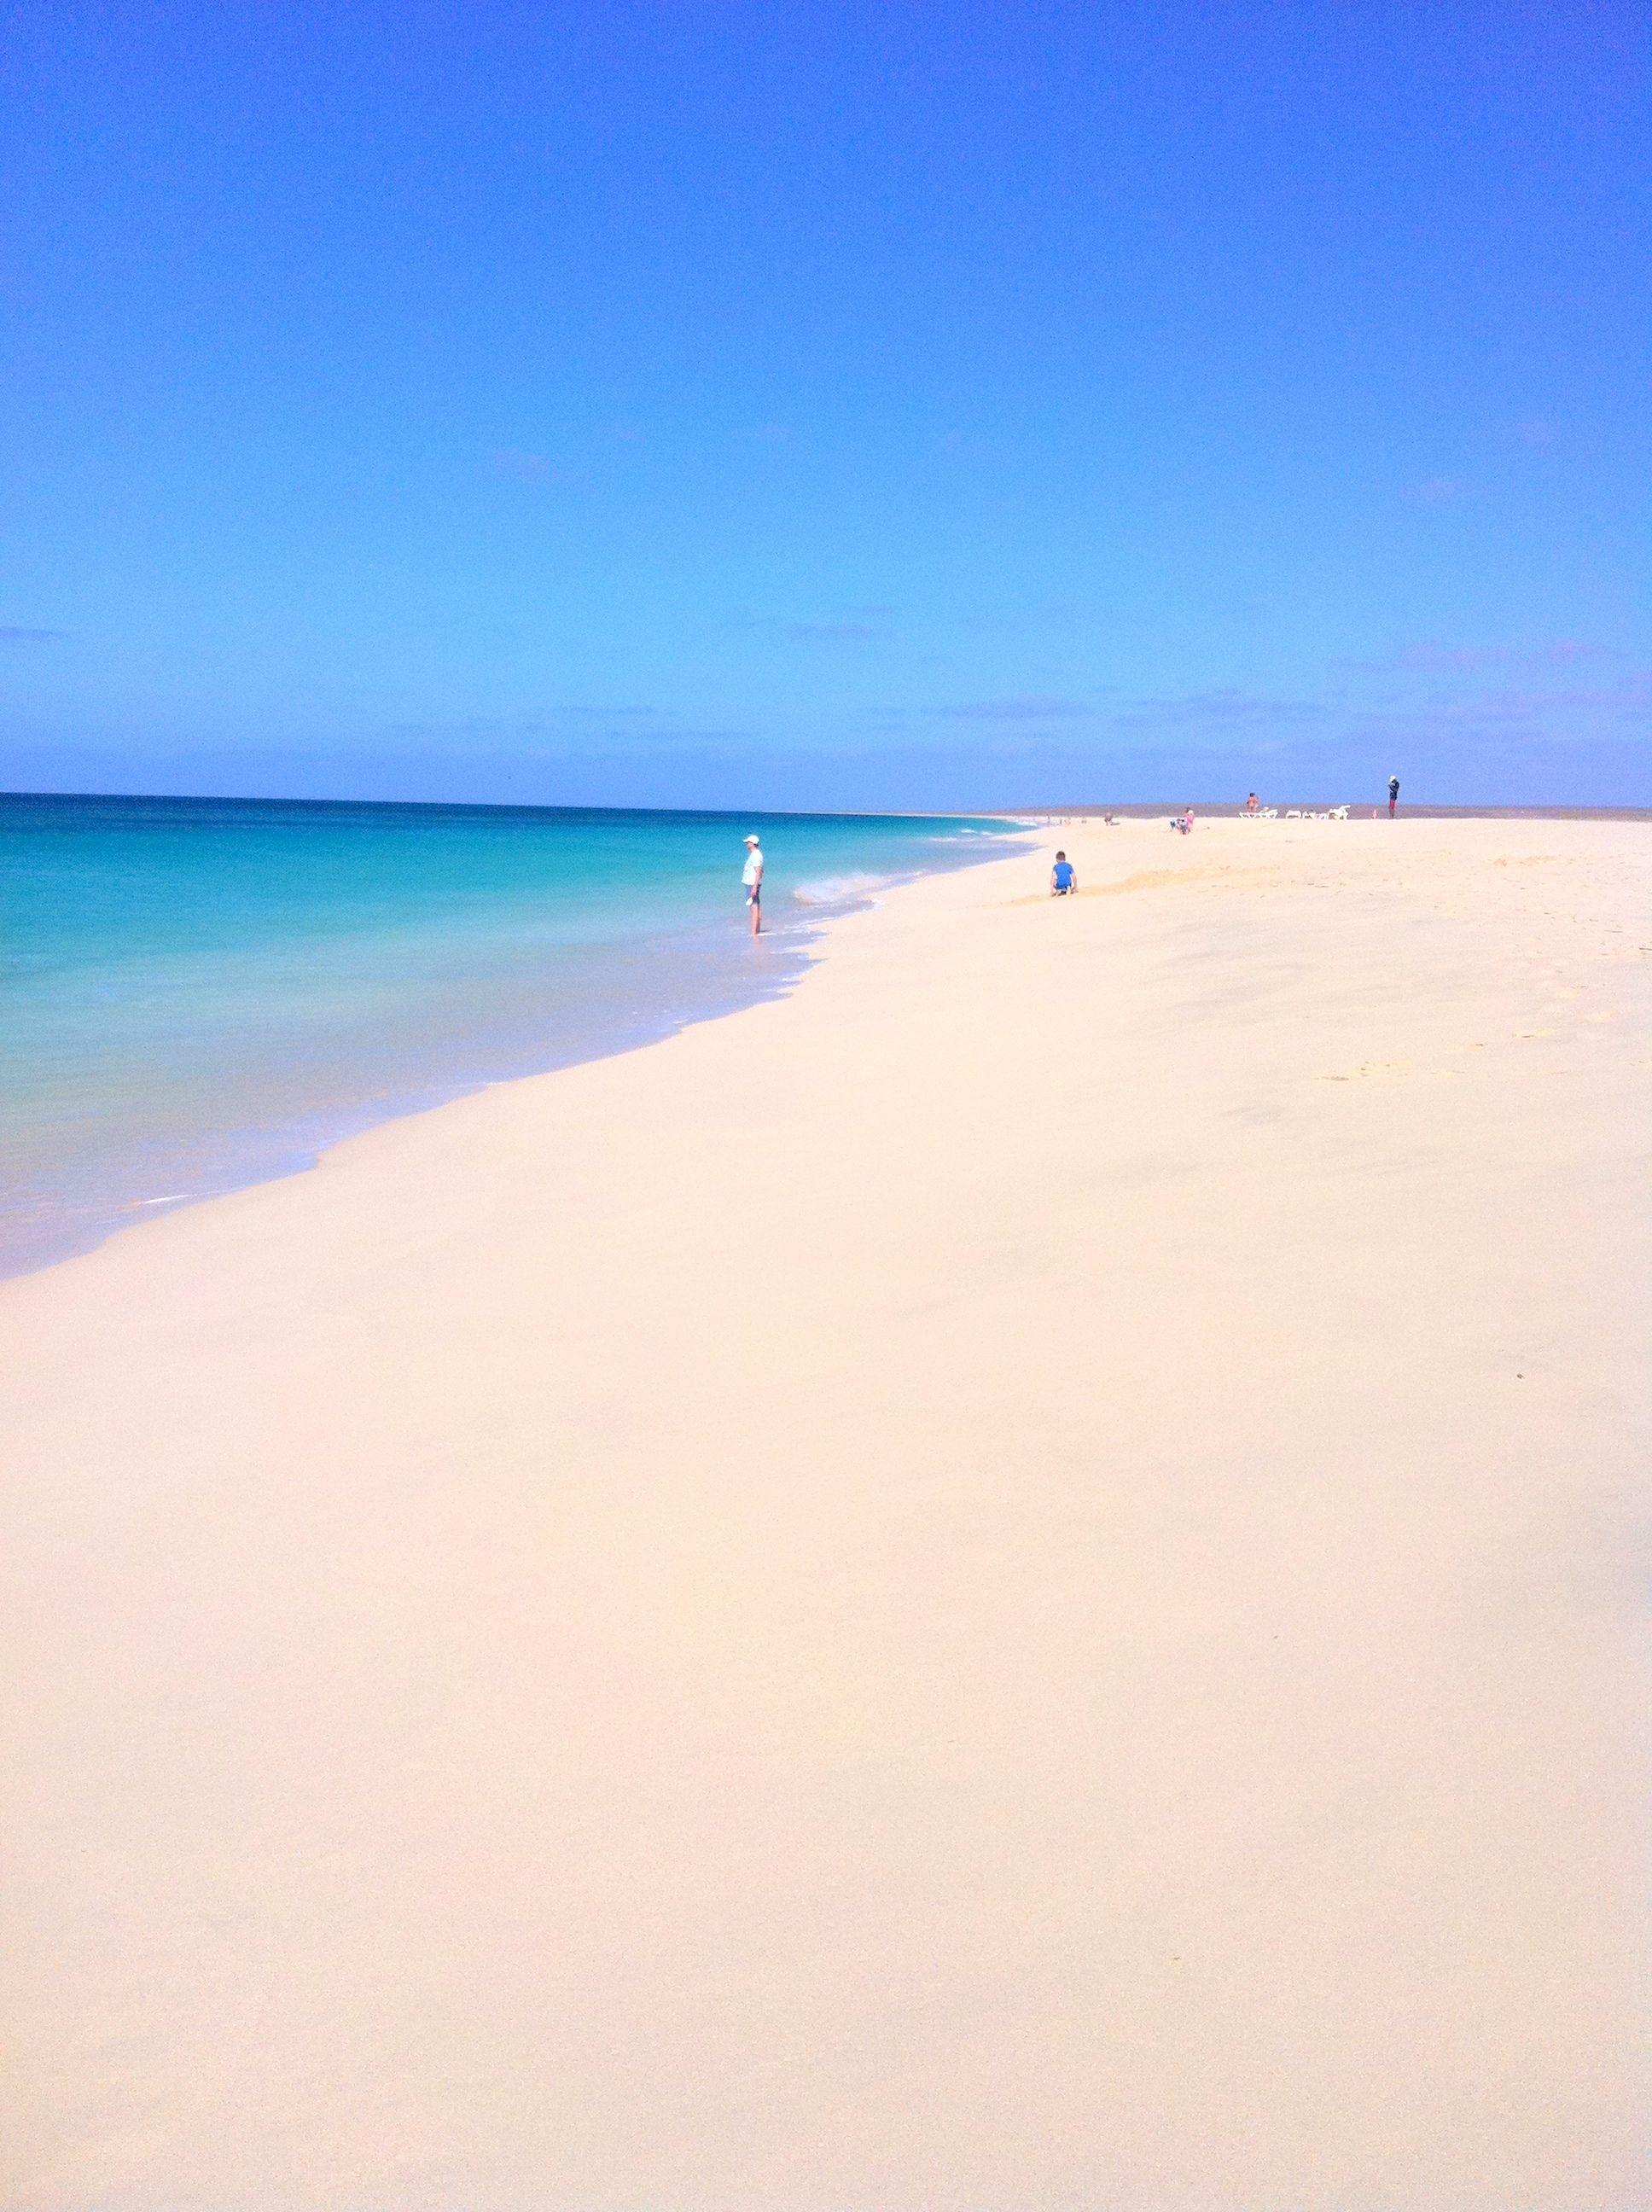 The beaches of Cape Verde Islands. Travel to Cape Verde Islands with MORABITUR DMC. A member of GONDWANA DMCs, your network of boutique Destination Management Companies across the globe. www.gondwana-dmcs.net